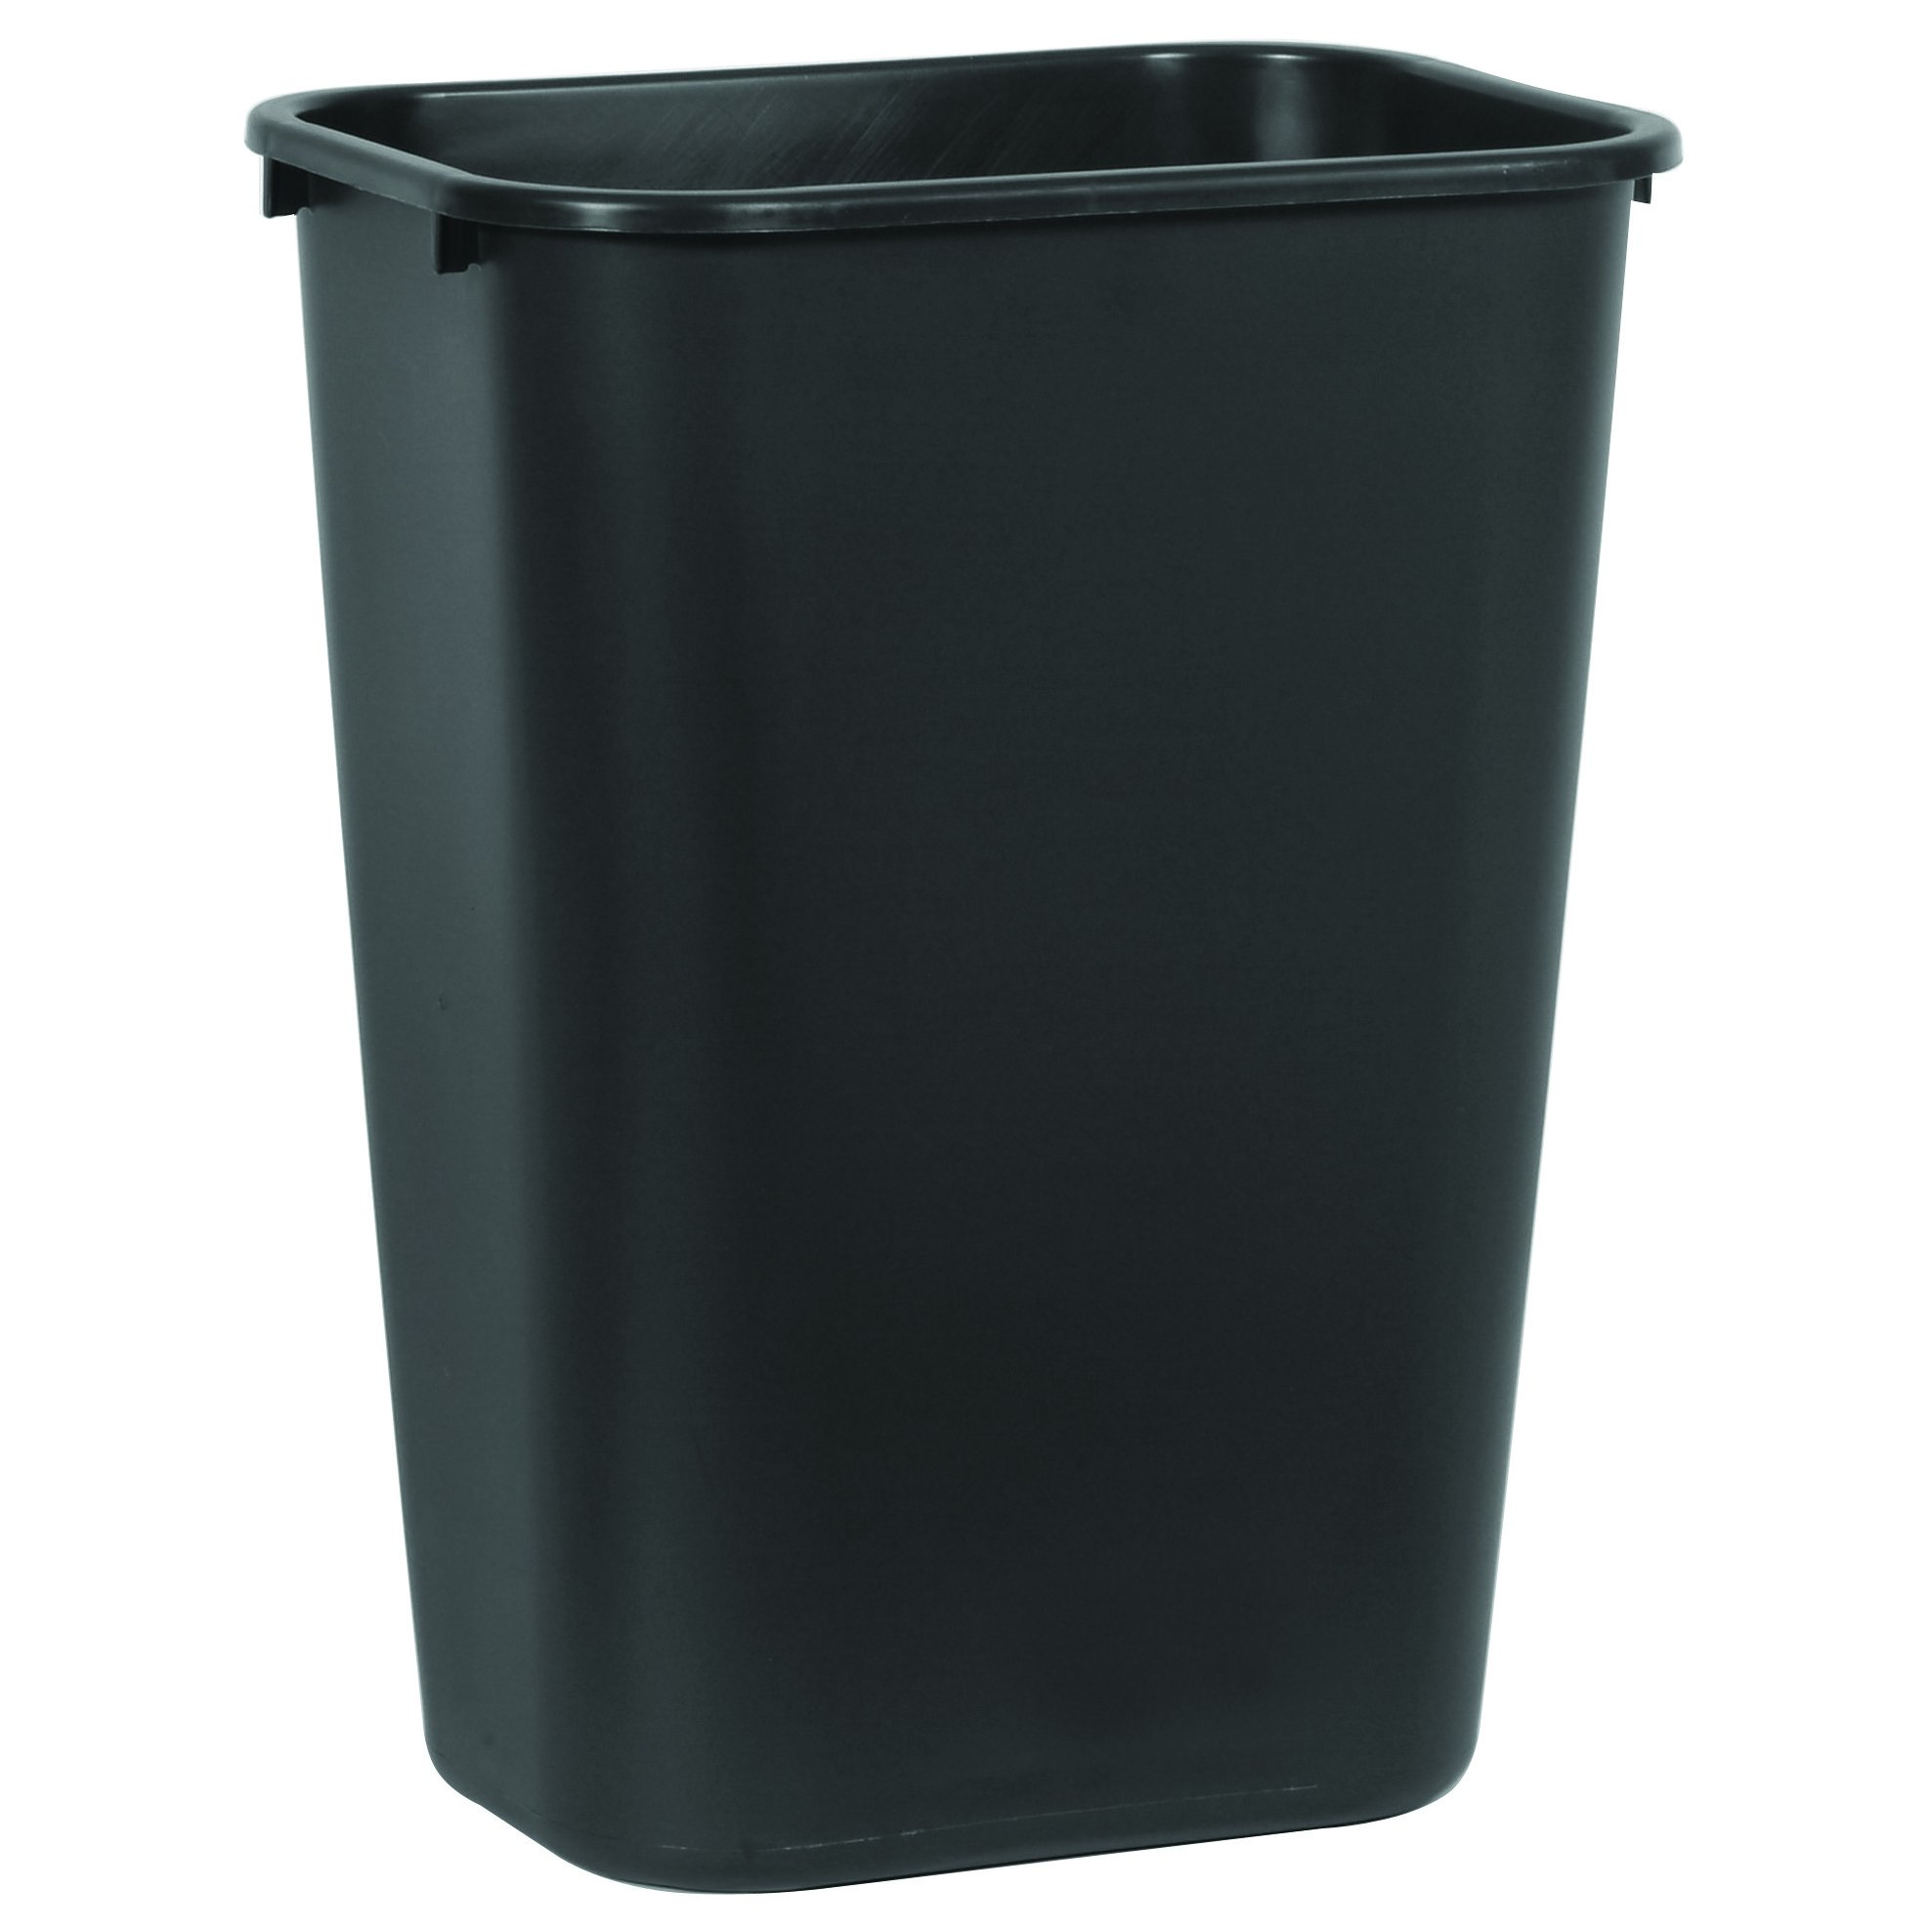 Rubbermaid Commercial Deskside Trash Can, 10 Gallon, Black (FG295700BLA) (Pack of 12)